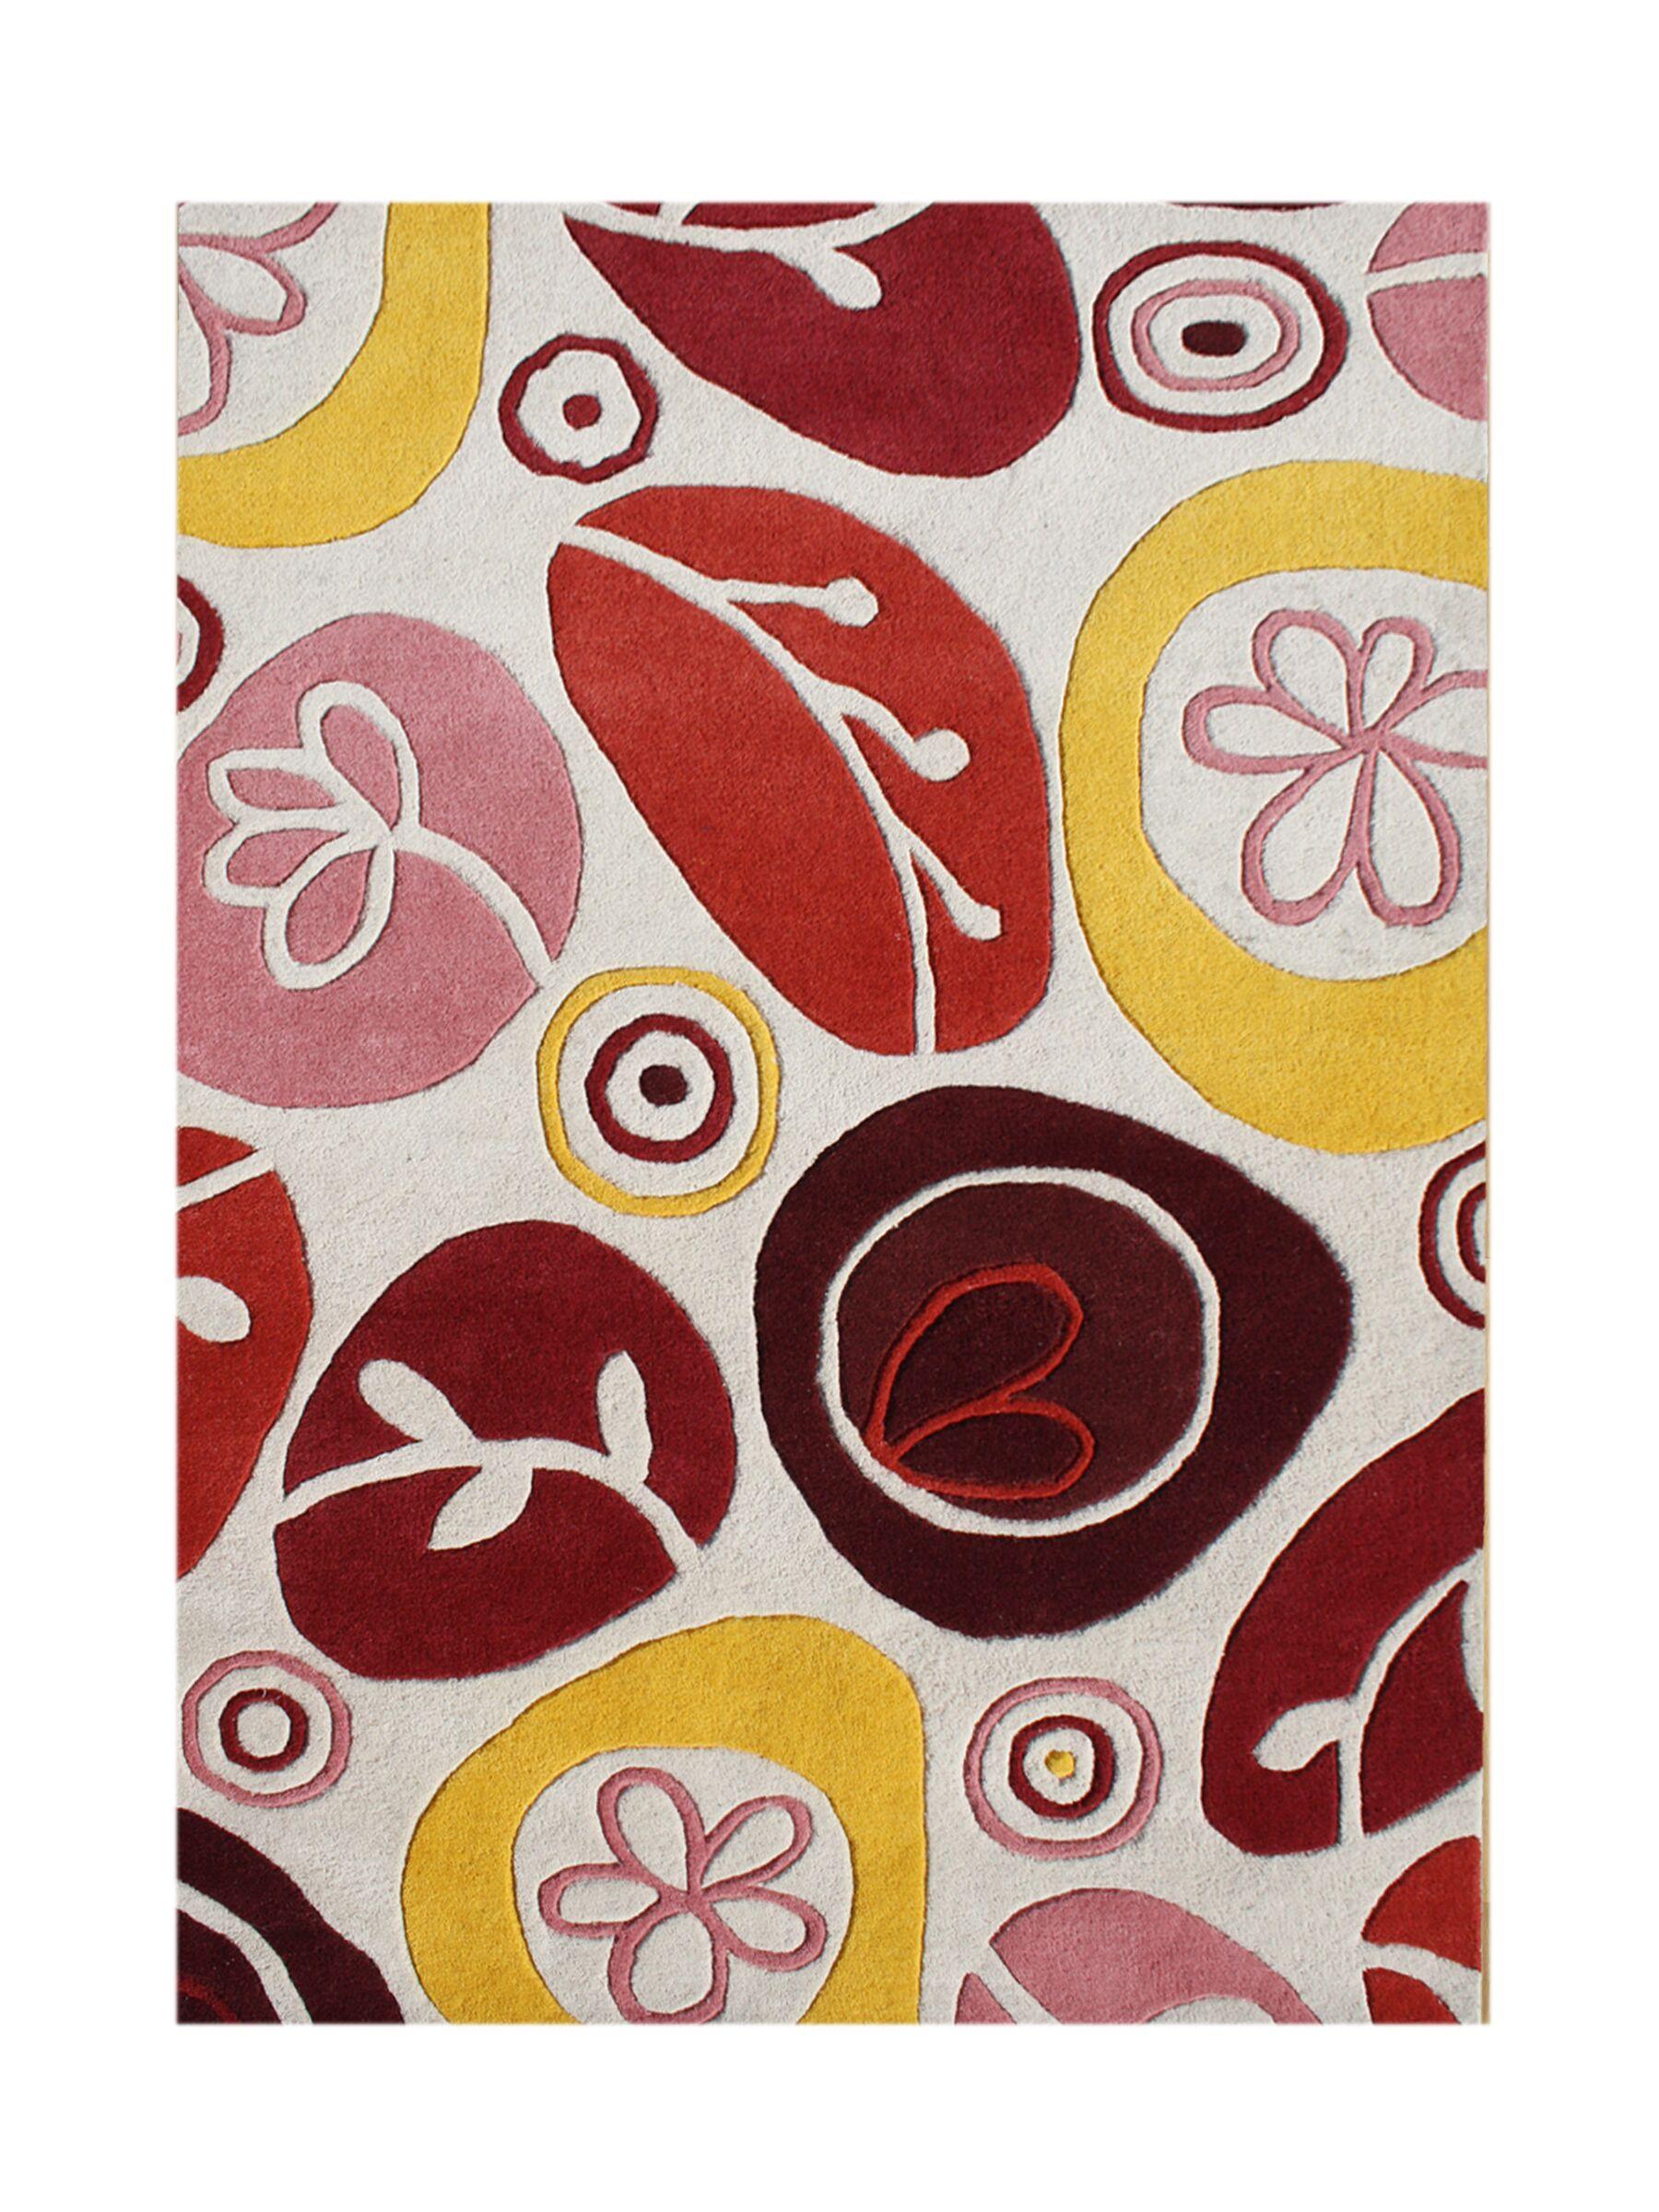 Bernal Hand-Tufted Area Rug Rug Size: 8' x 10'